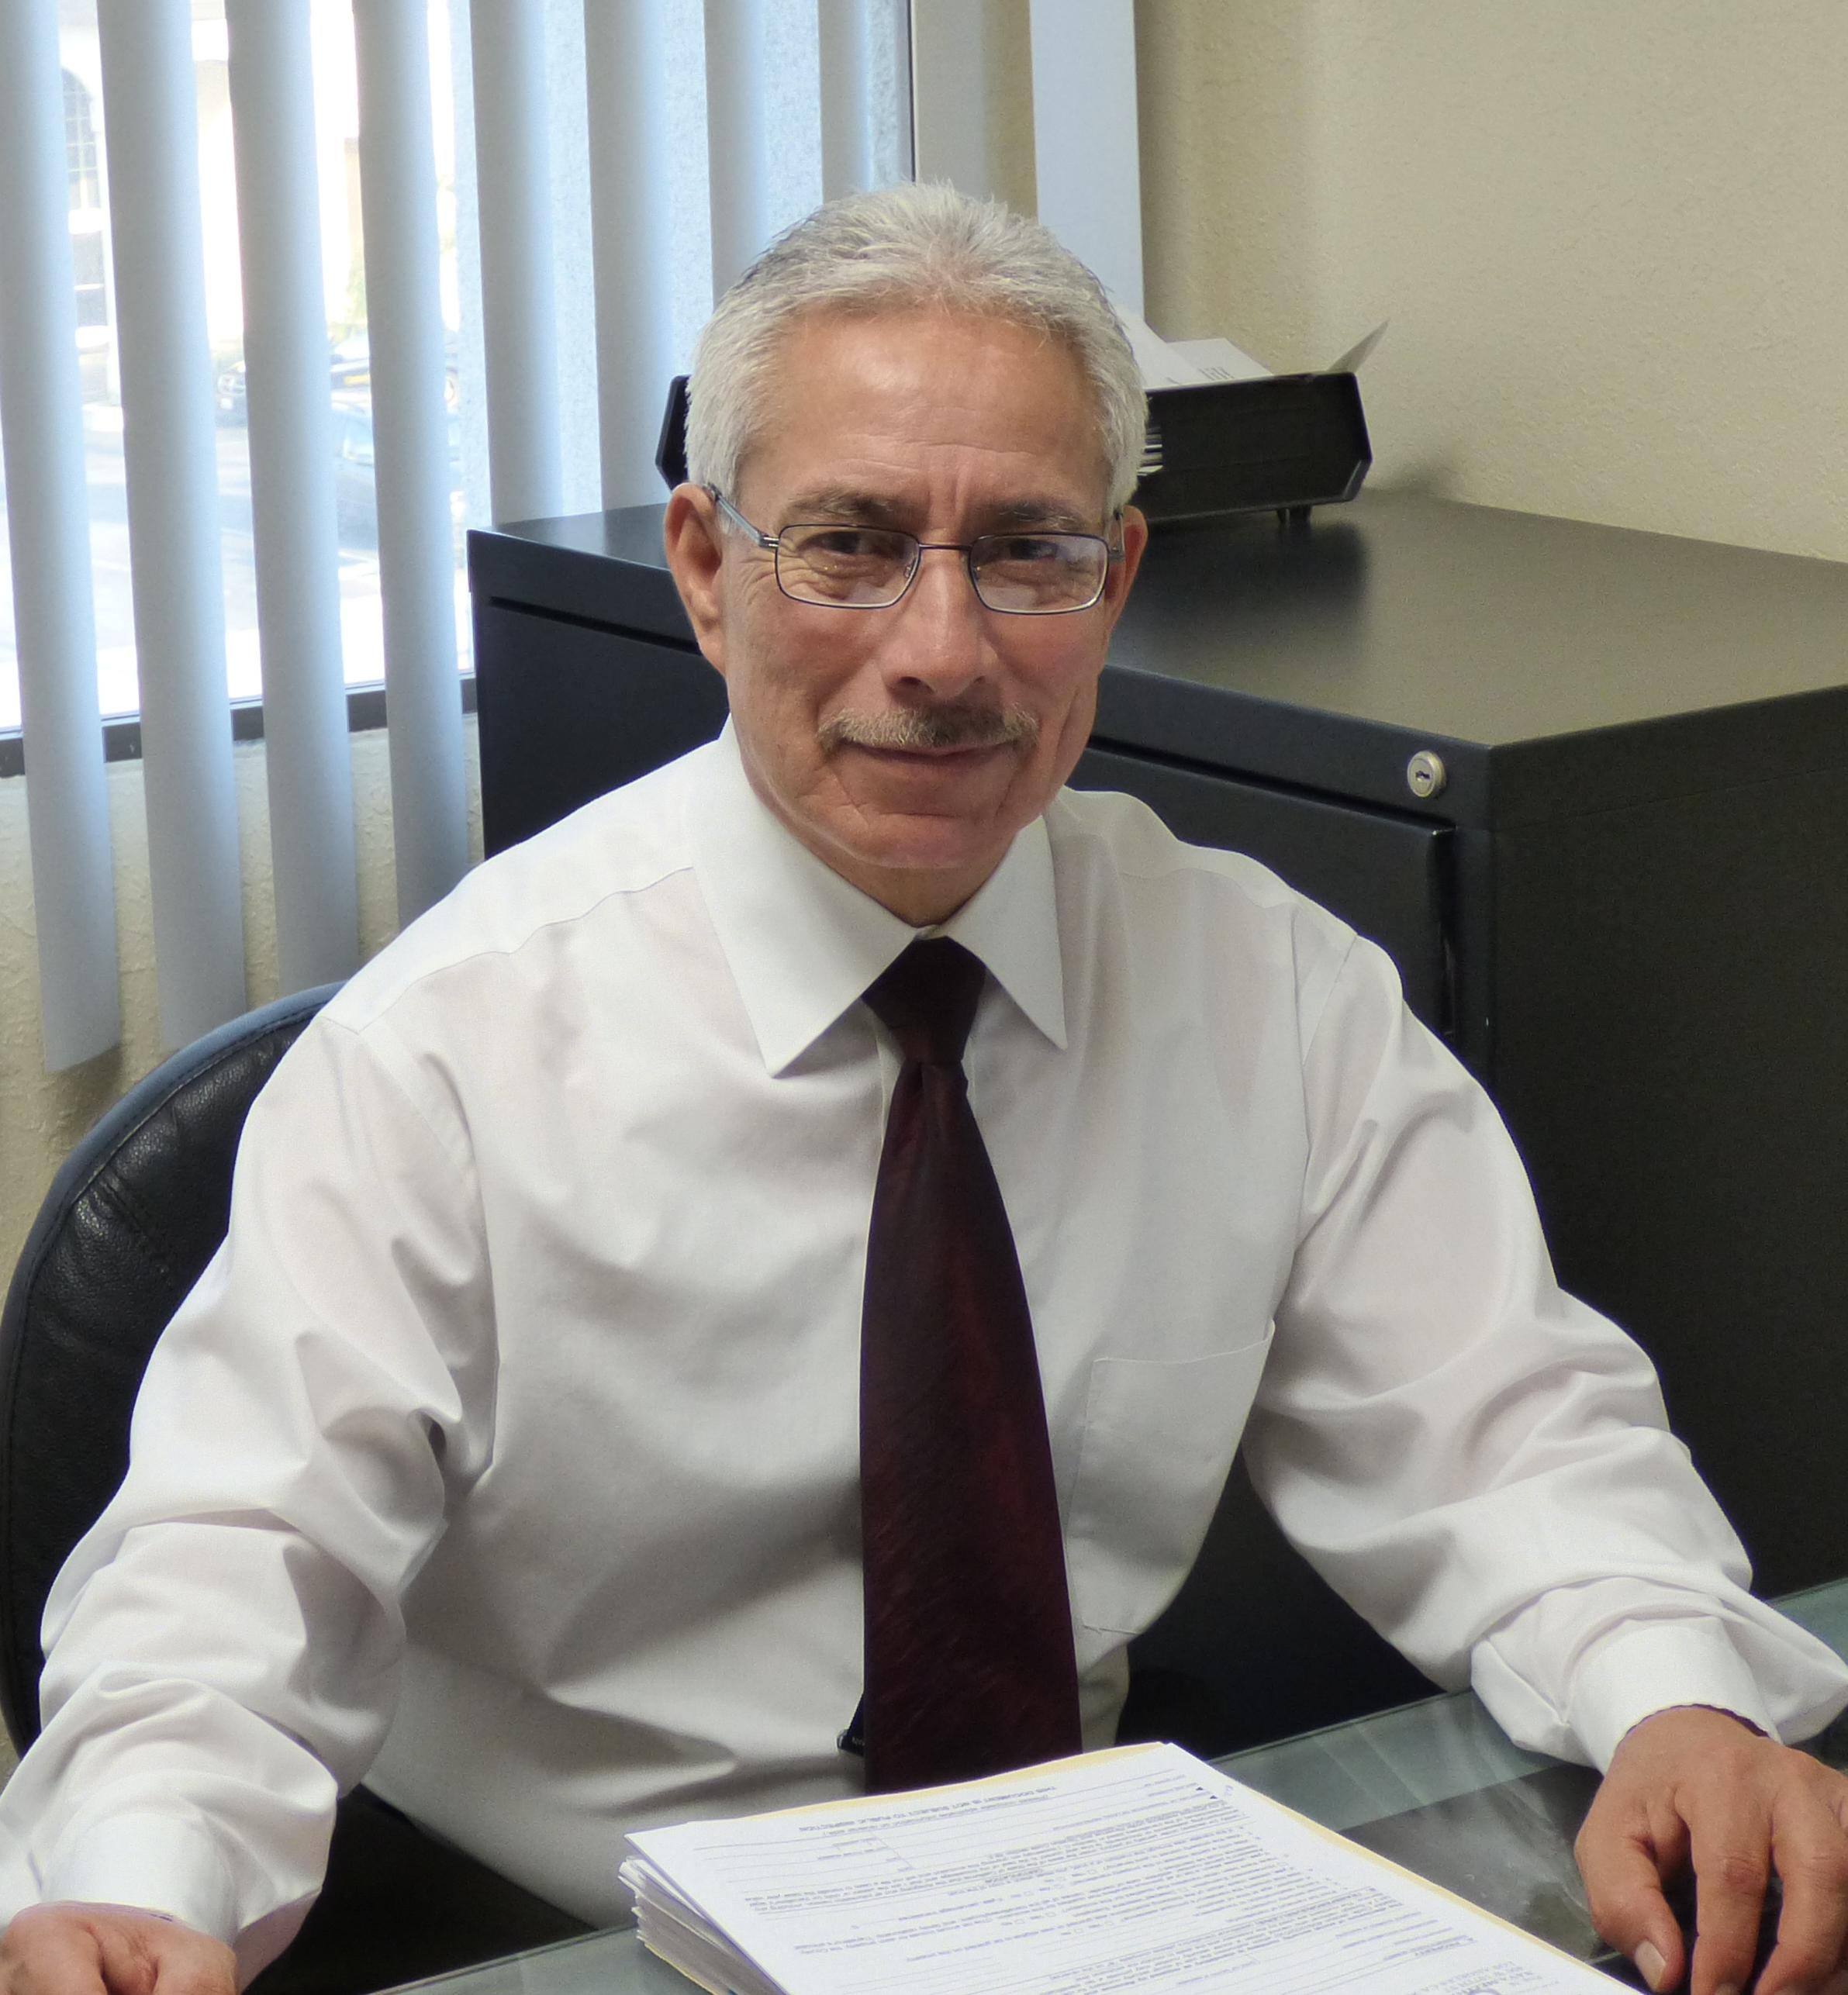 Jose M. Rosales